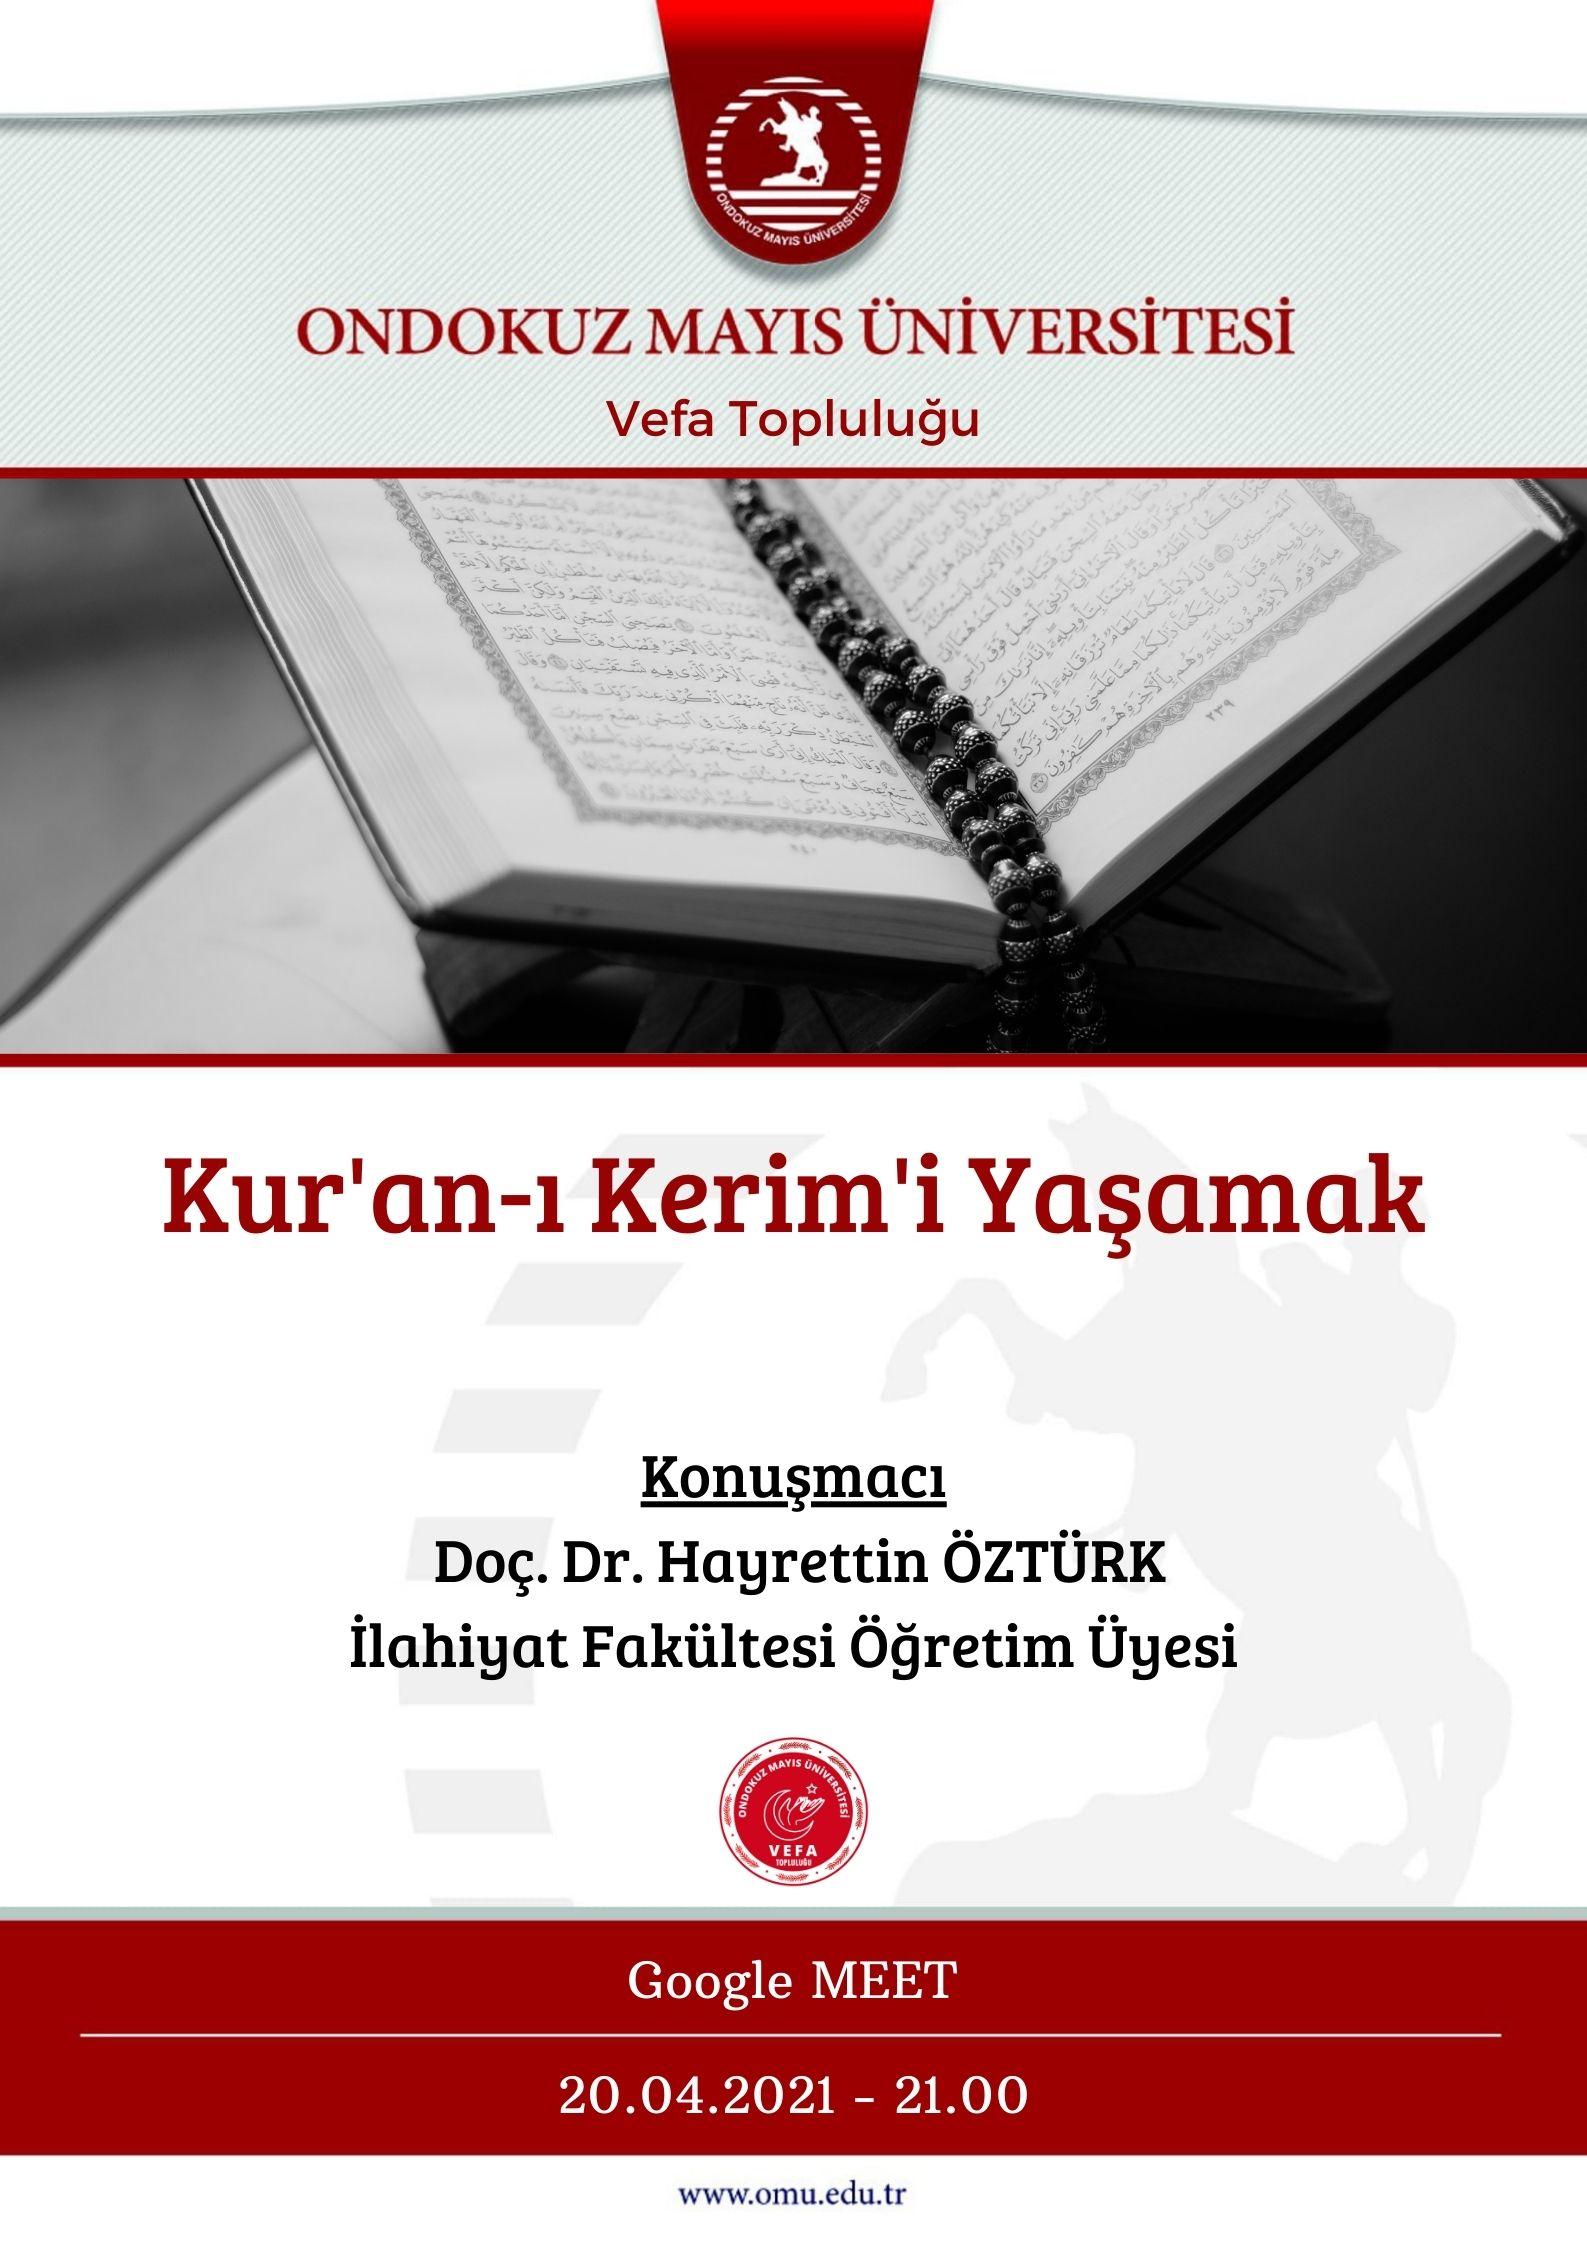 https://www.omu.edu.tr/sites/default/files/vefa_toplulugu_kuran-i_kerimi_yasatmak_afis.jpg